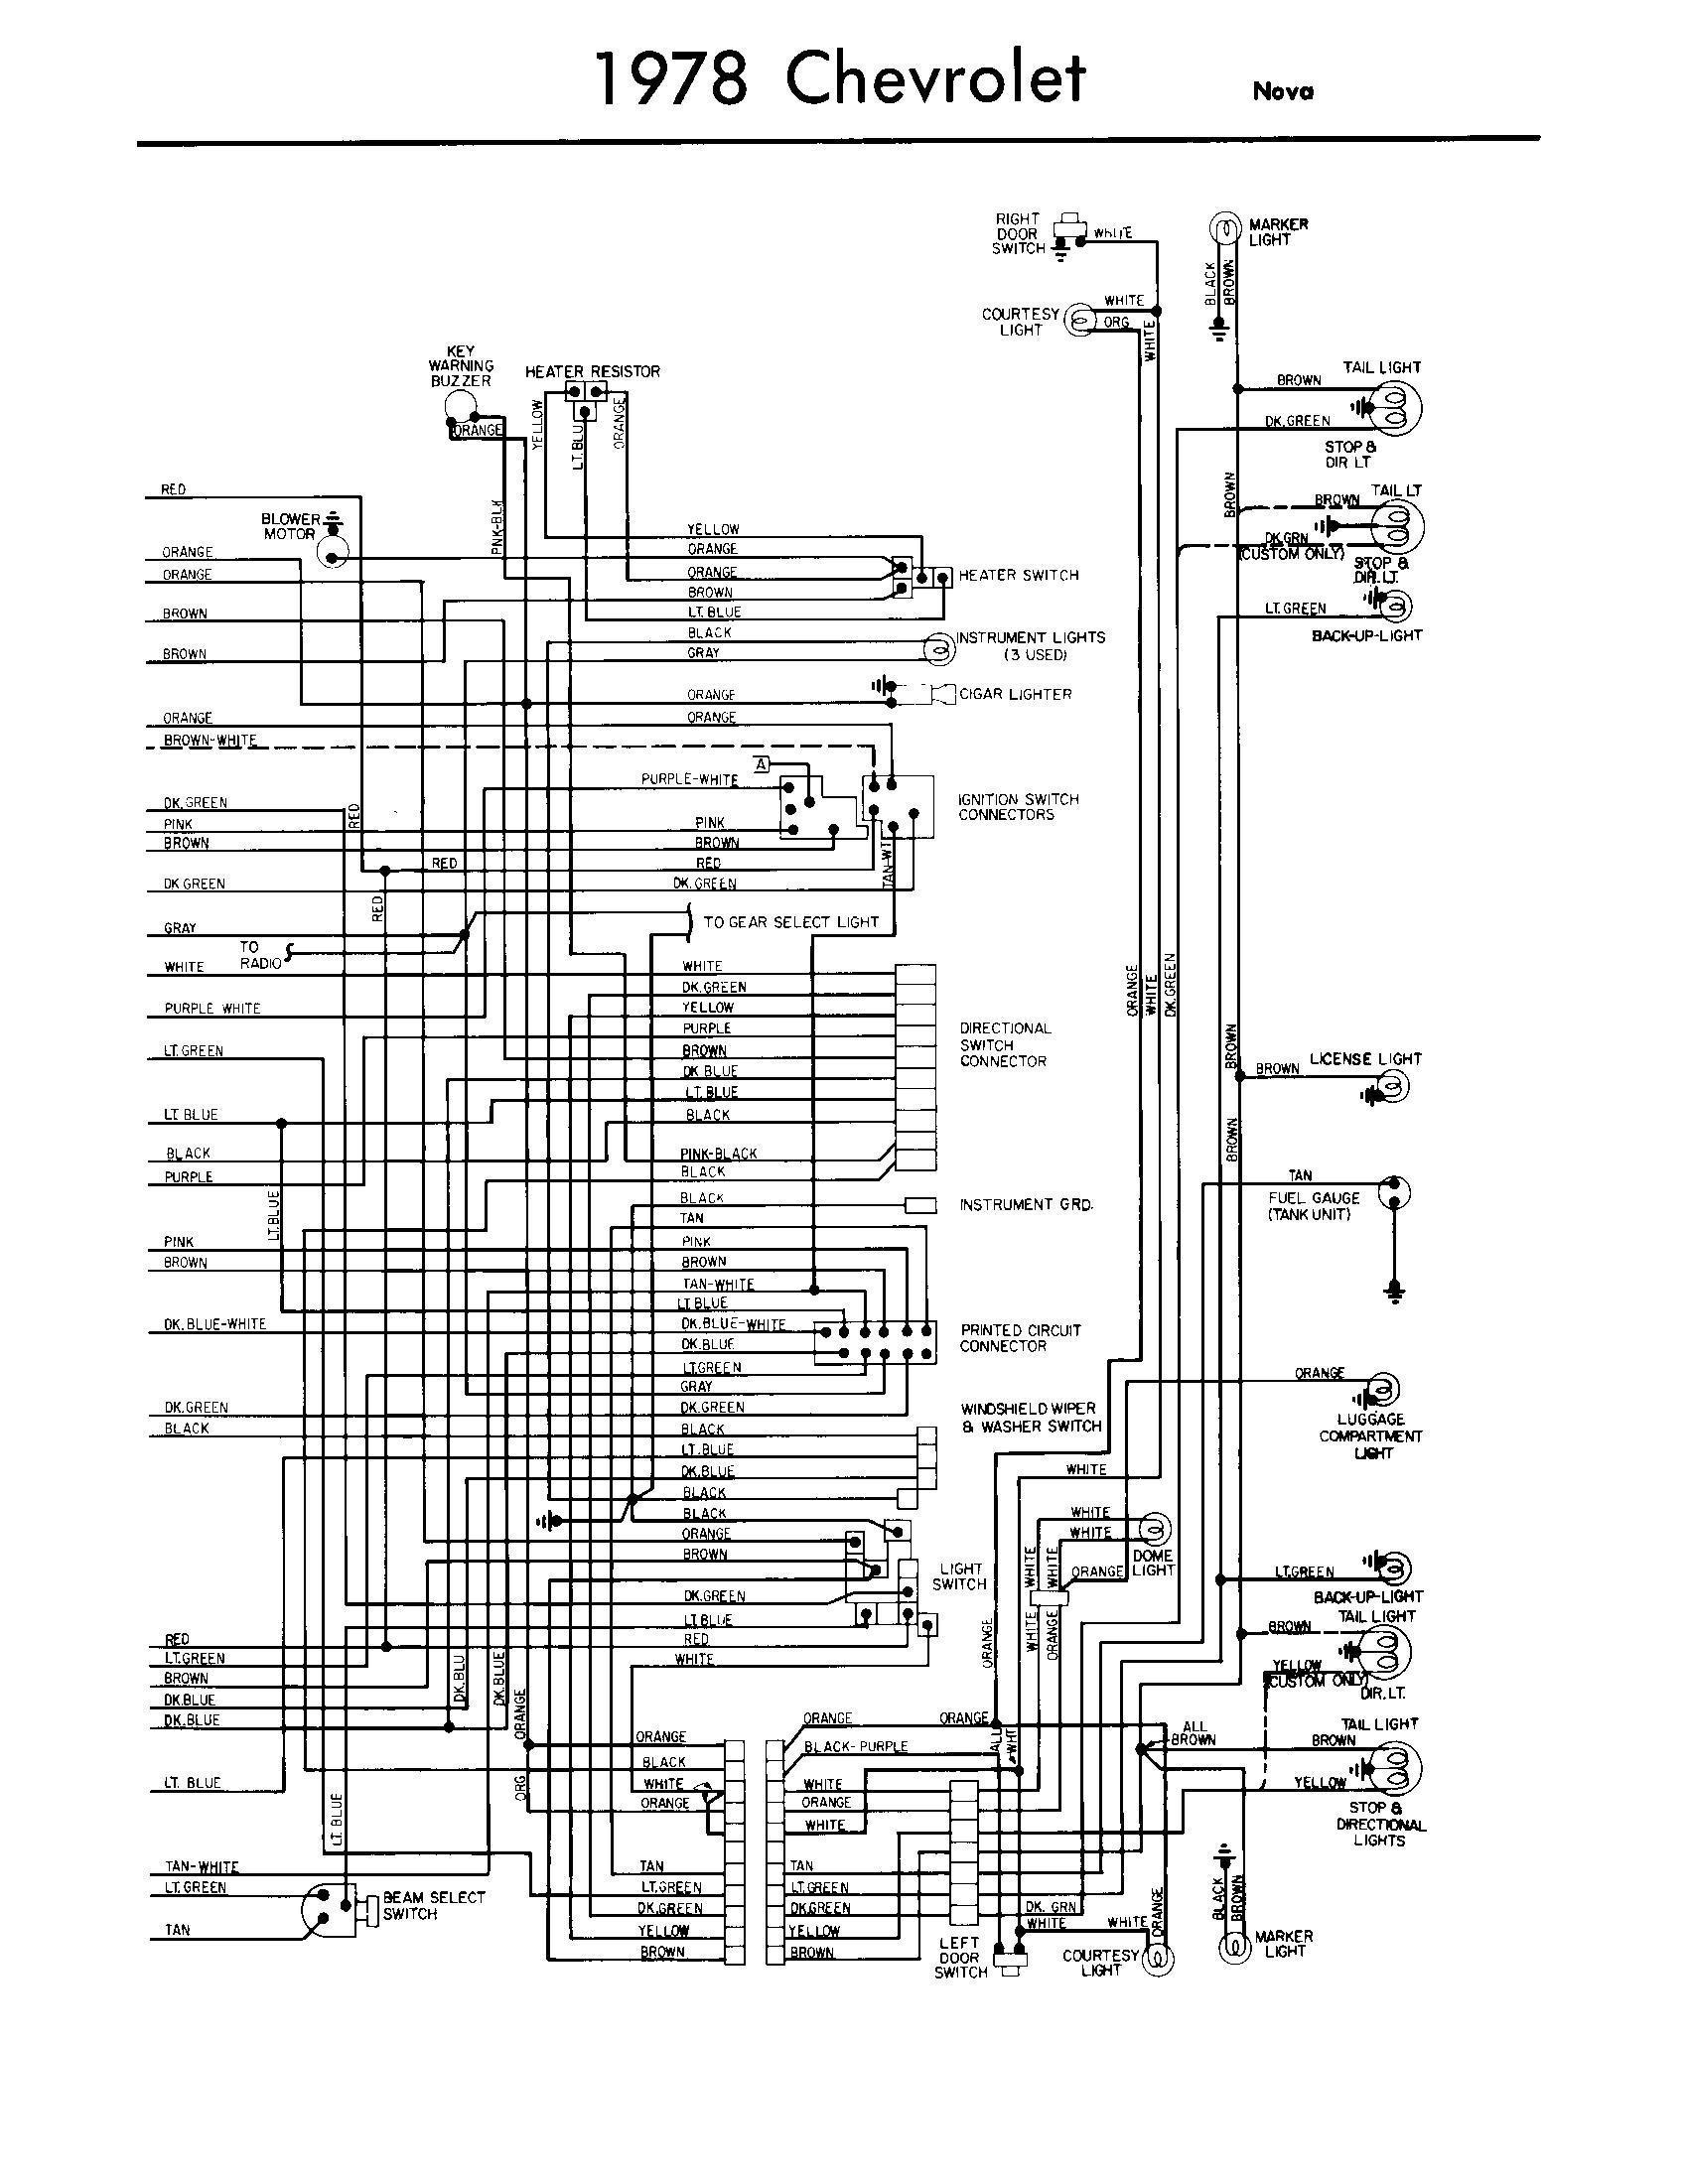 79 chevy cheyenne starter wiring diagram